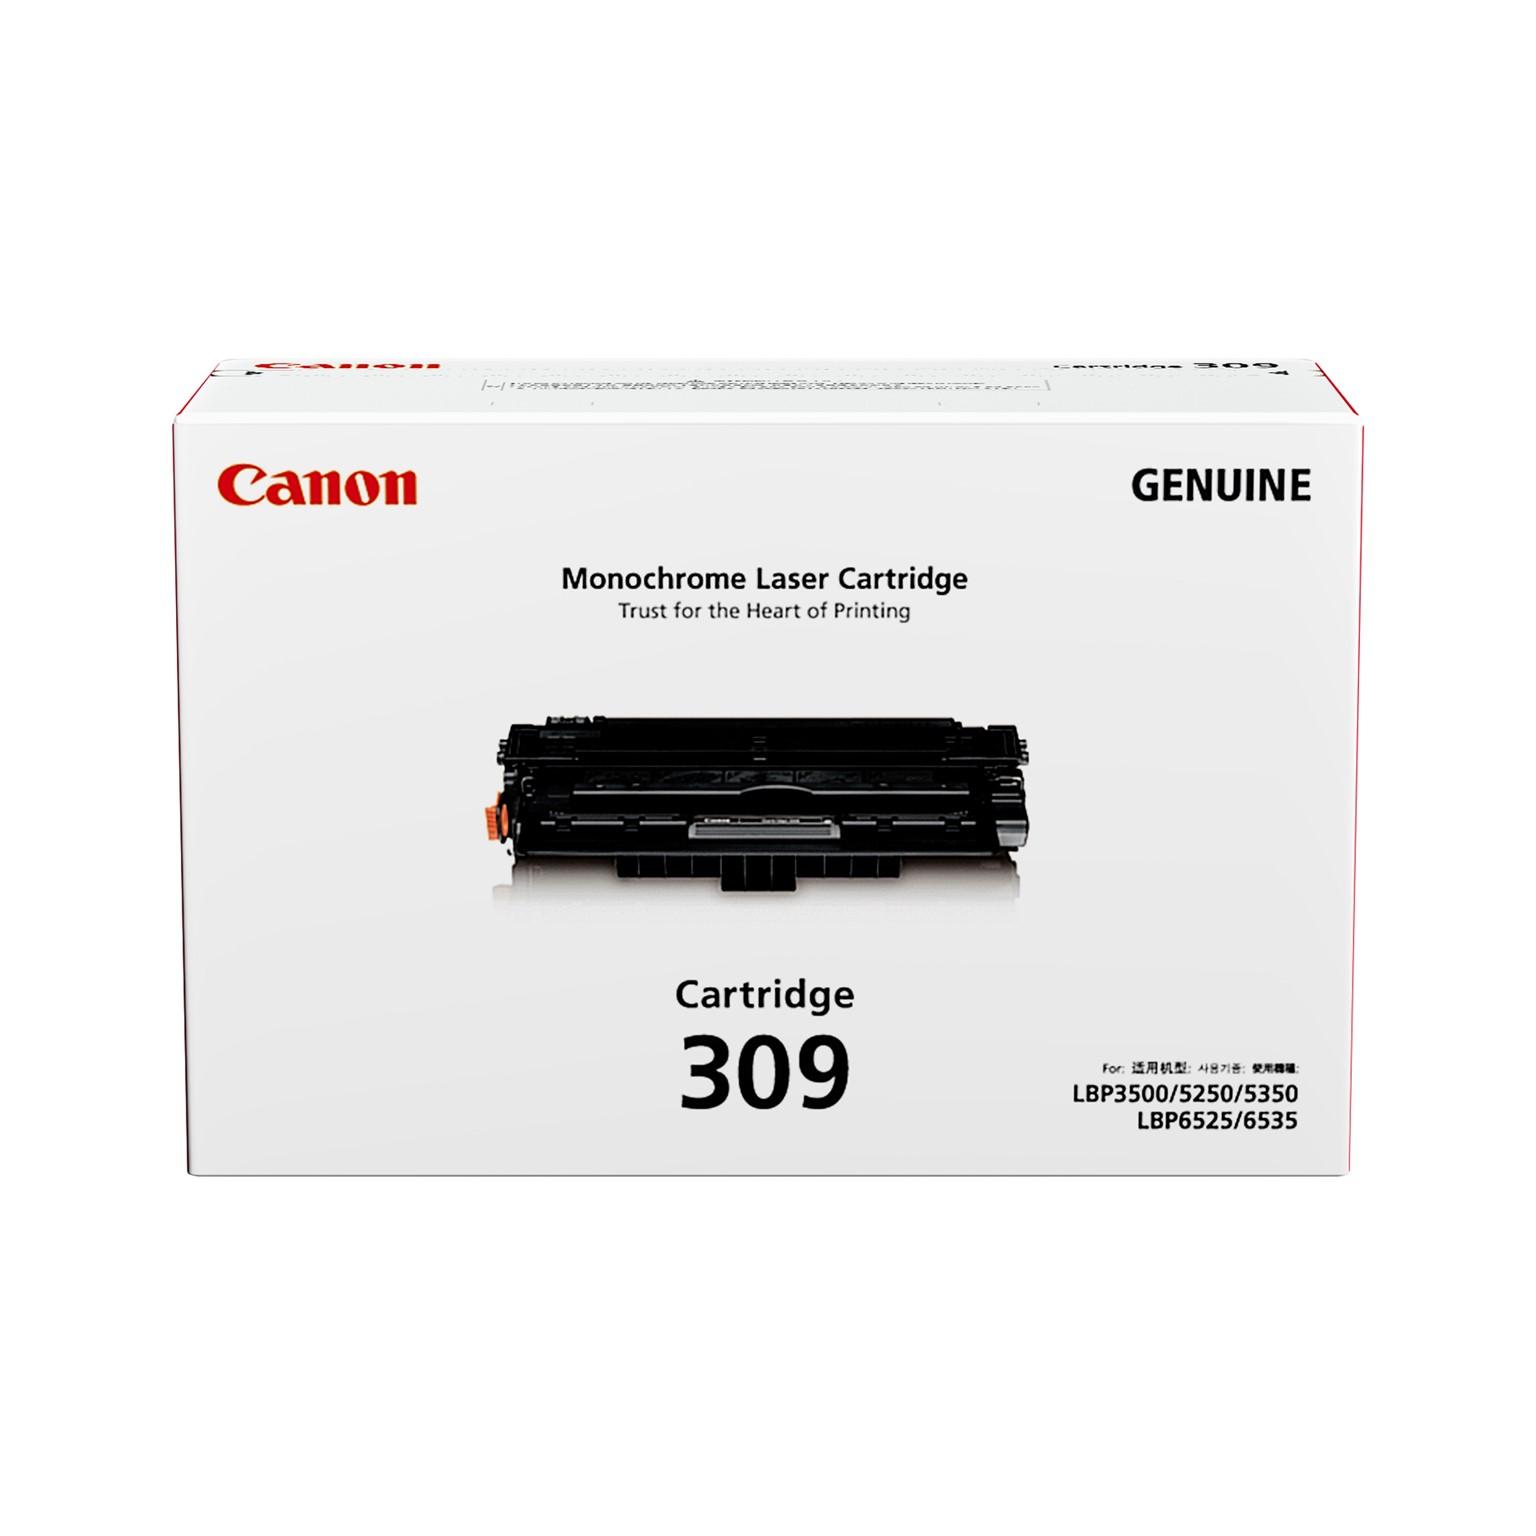 Canon Cartridge-309 Black